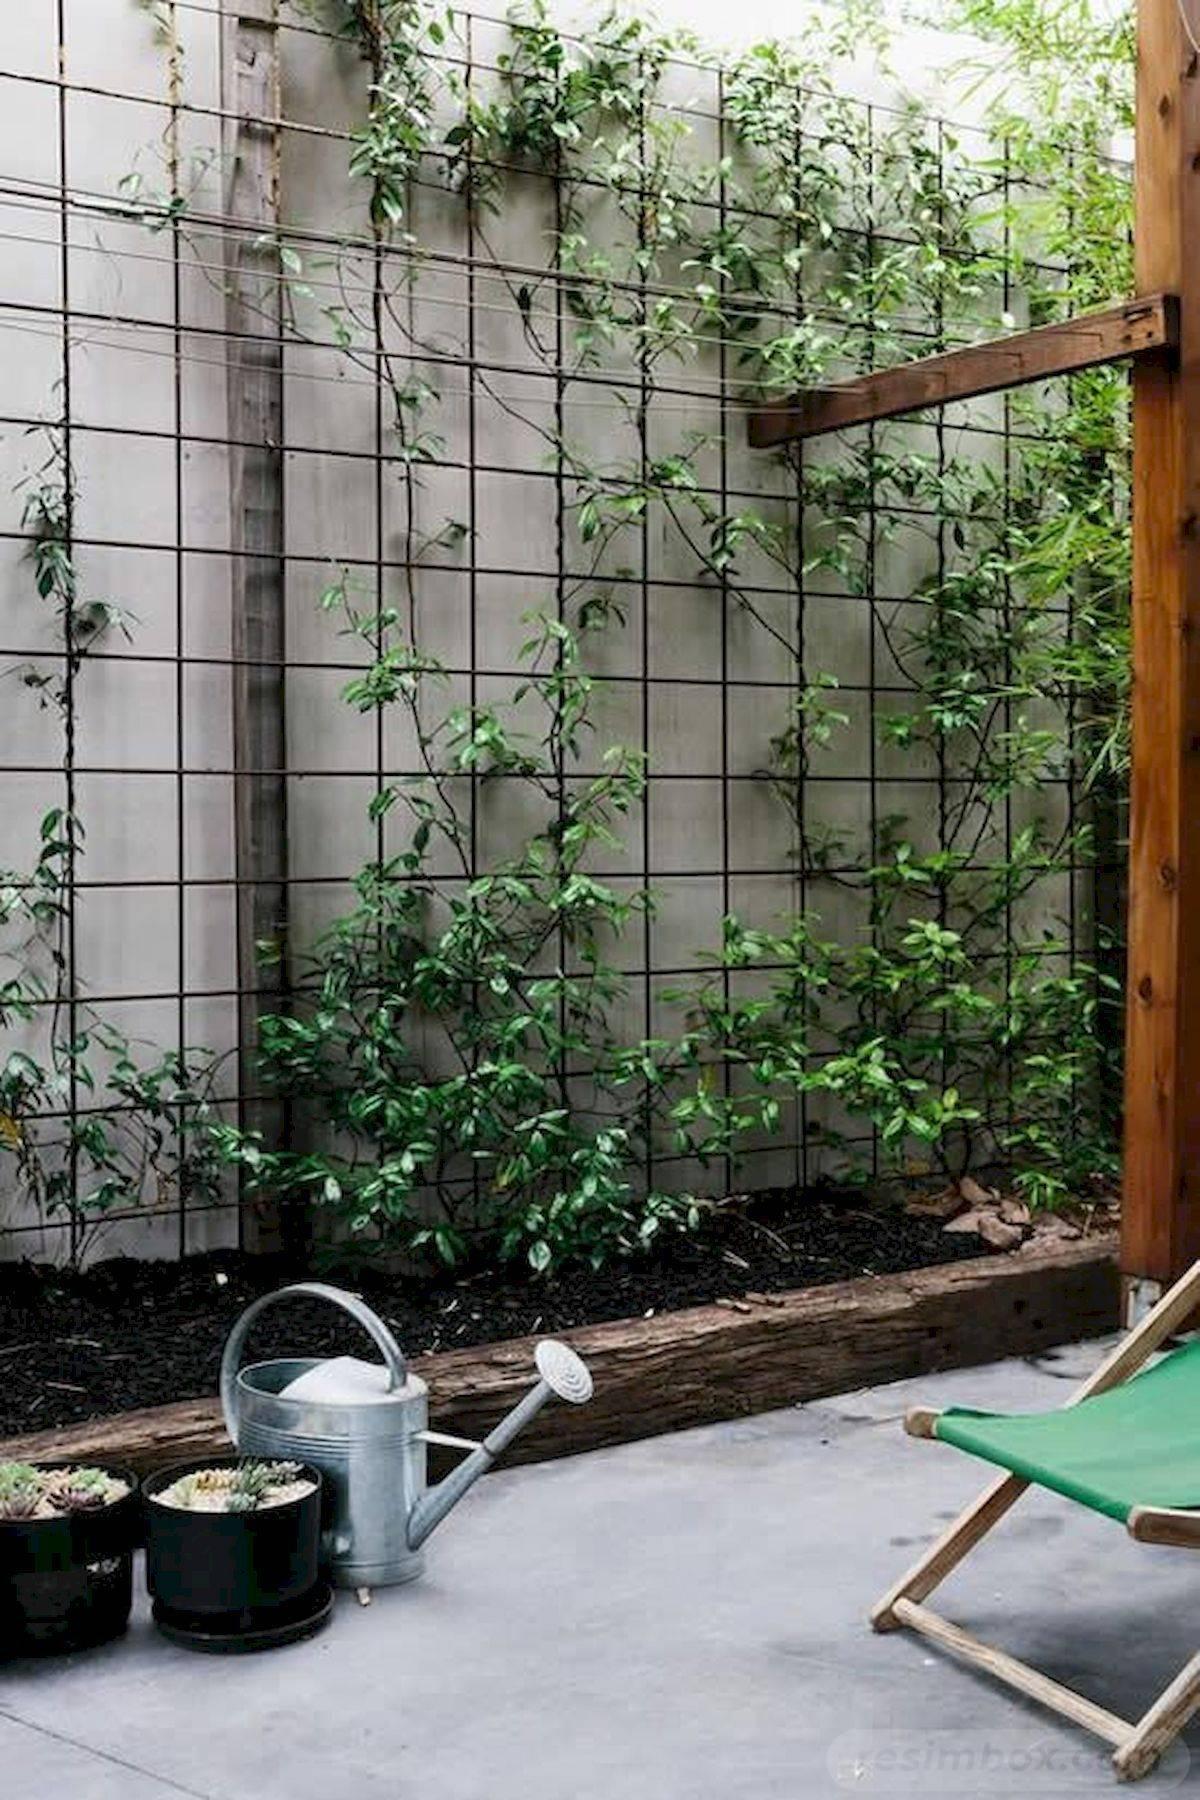 diy garden easy-692498880183645501